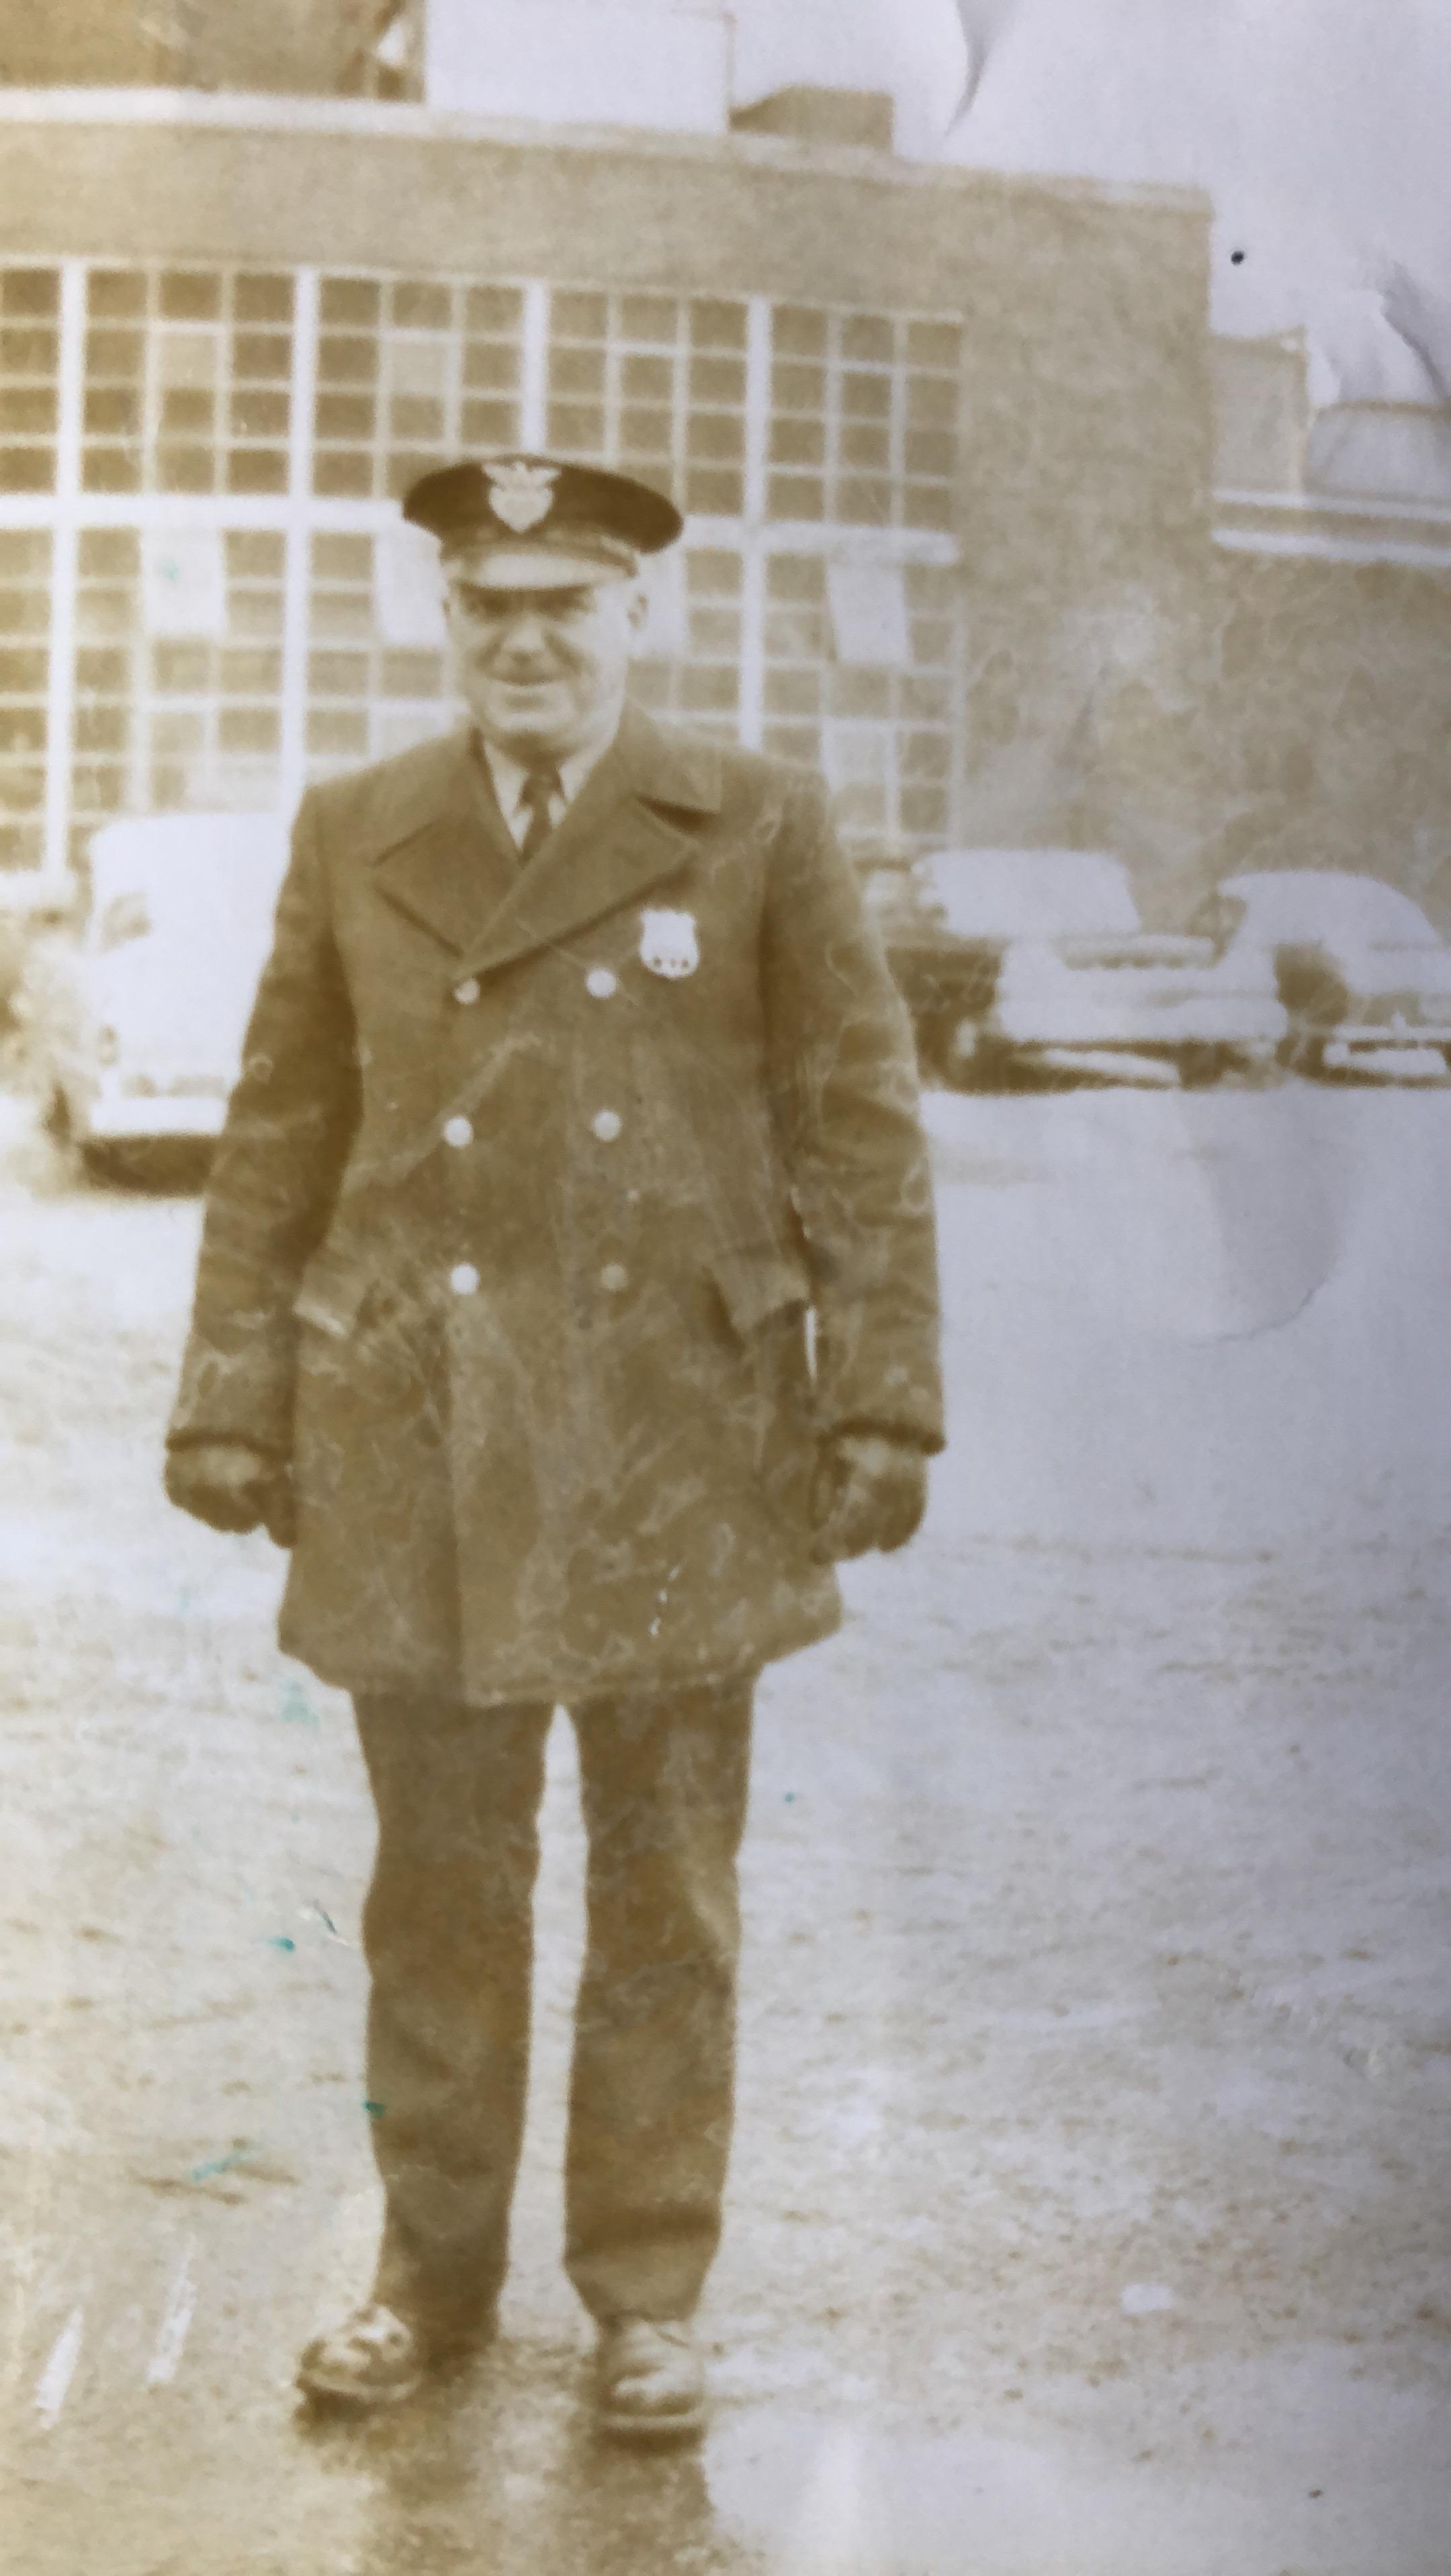 Patrolman John Zardeski | Wilkes-Barre Police Department, Pennsylvania